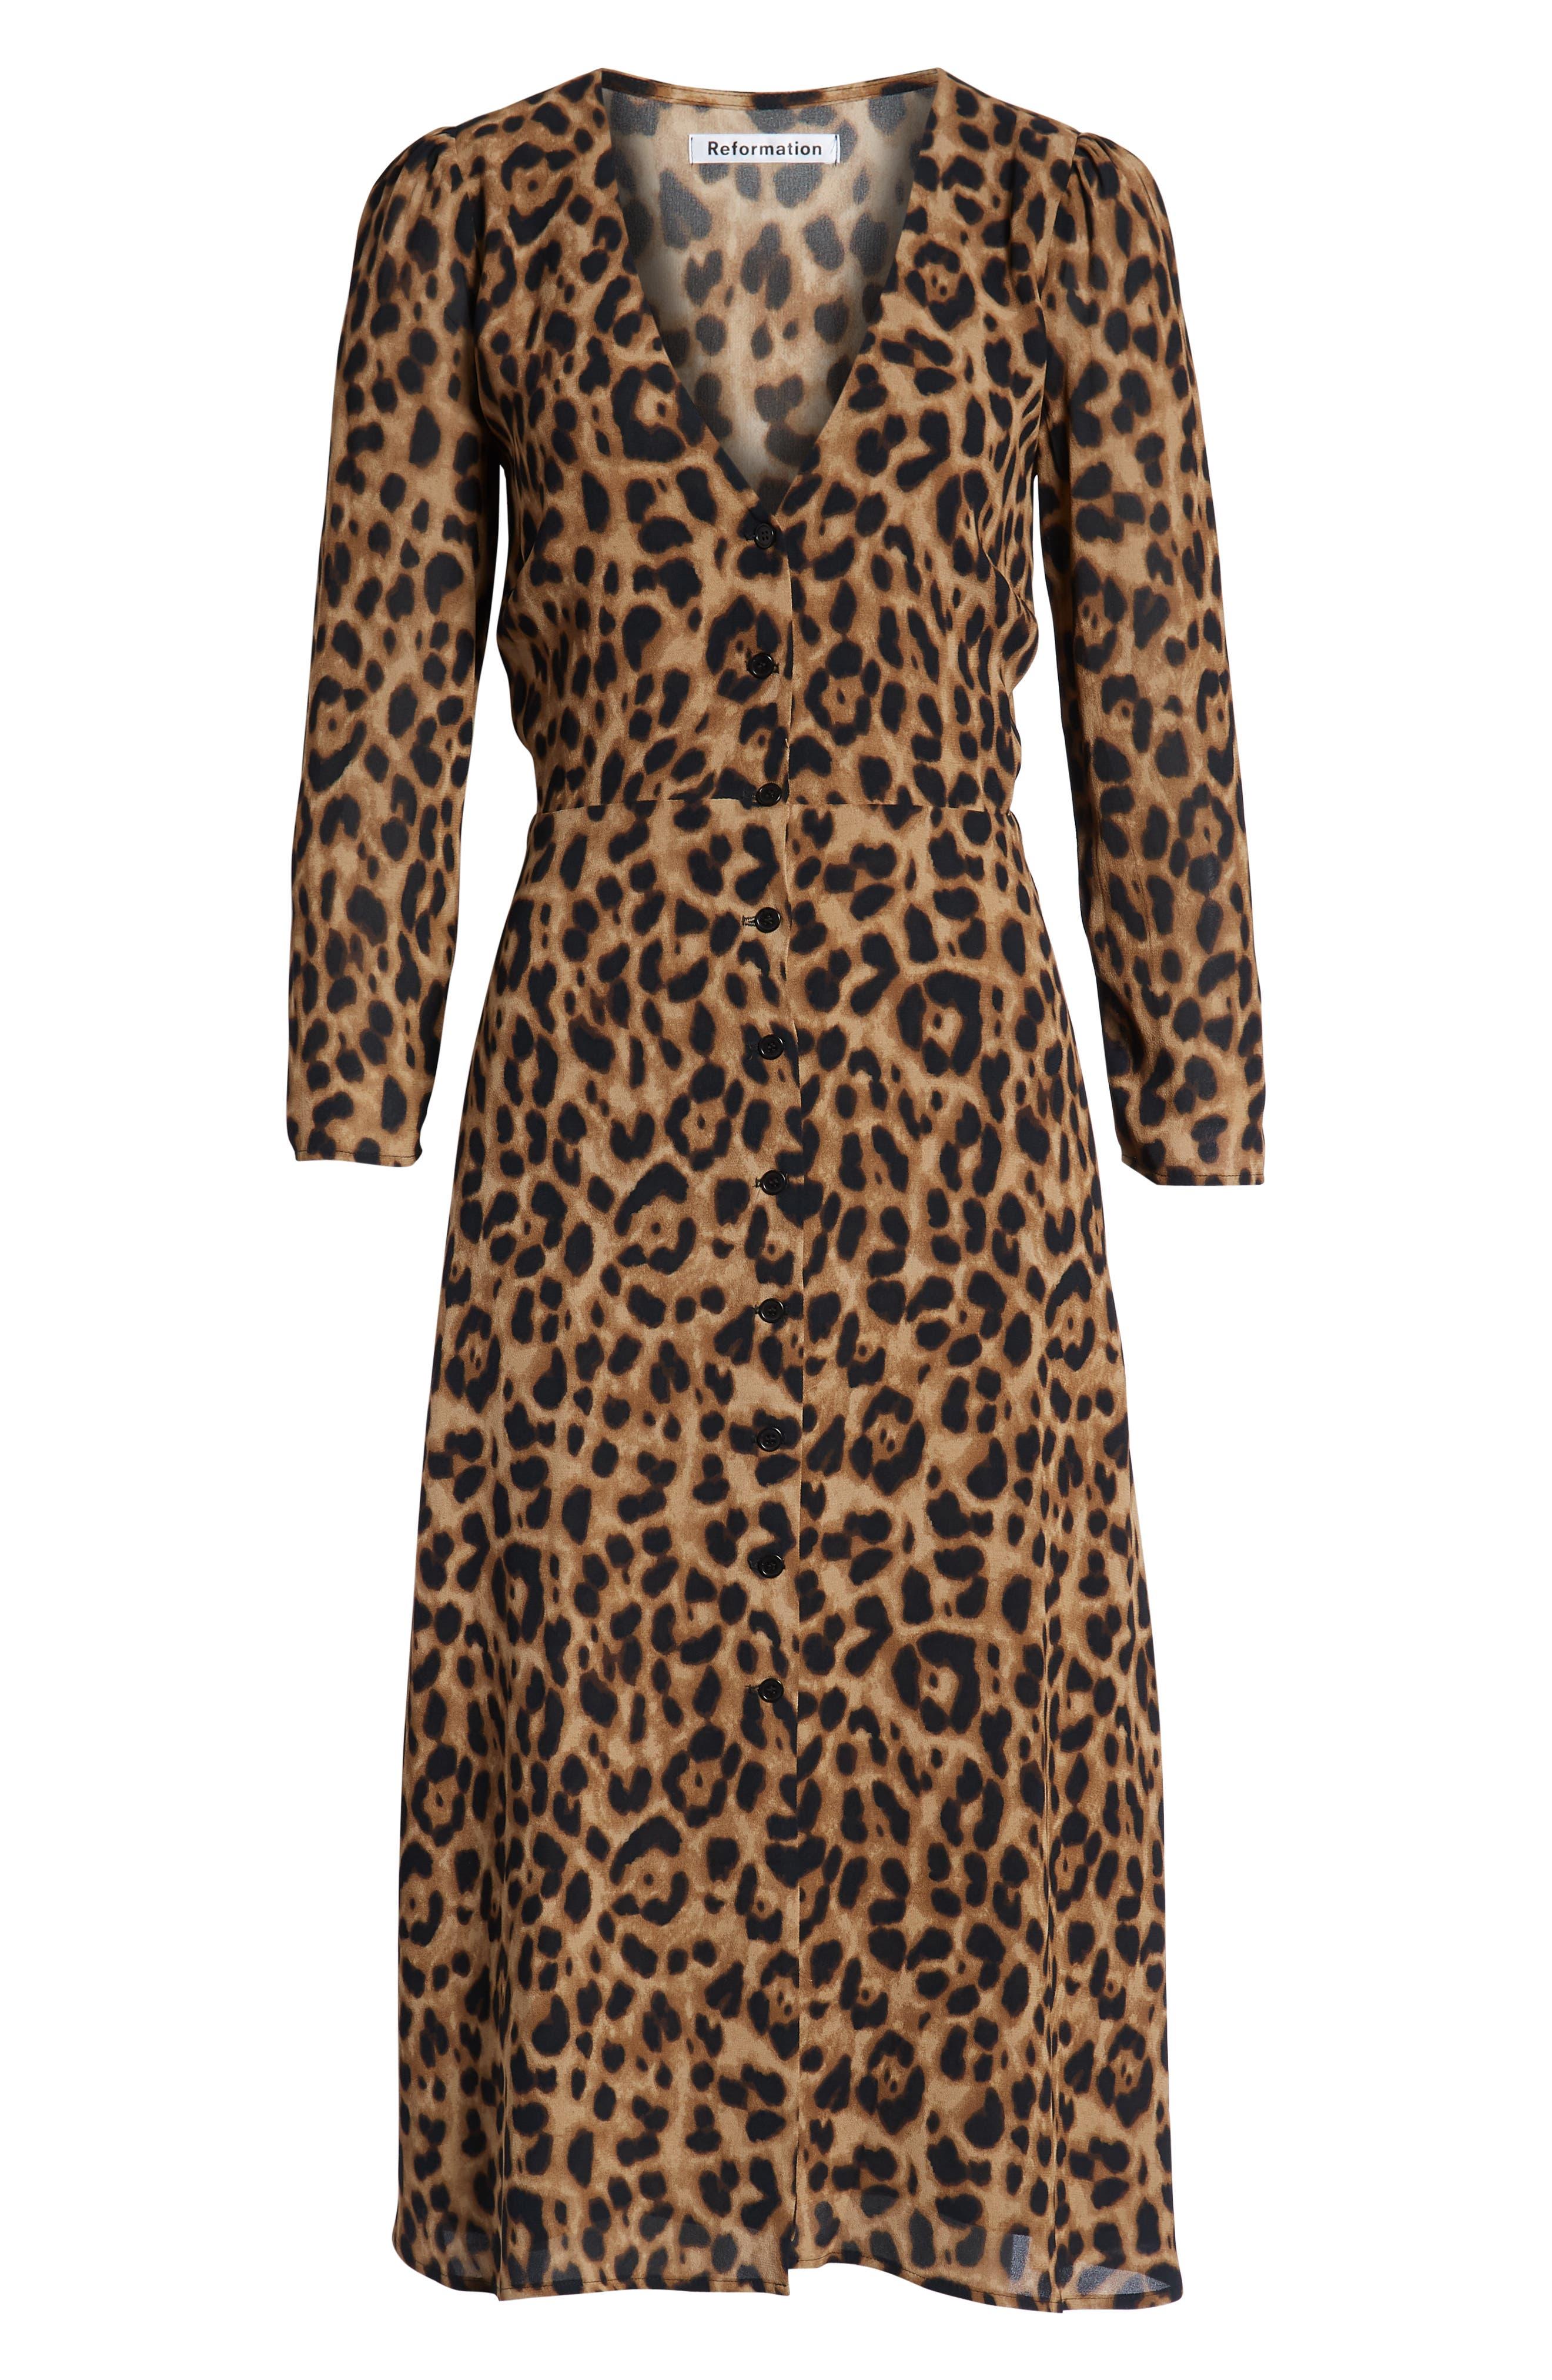 REFORMATION, Alma Midi Dress, Alternate thumbnail 5, color, LEOPARD